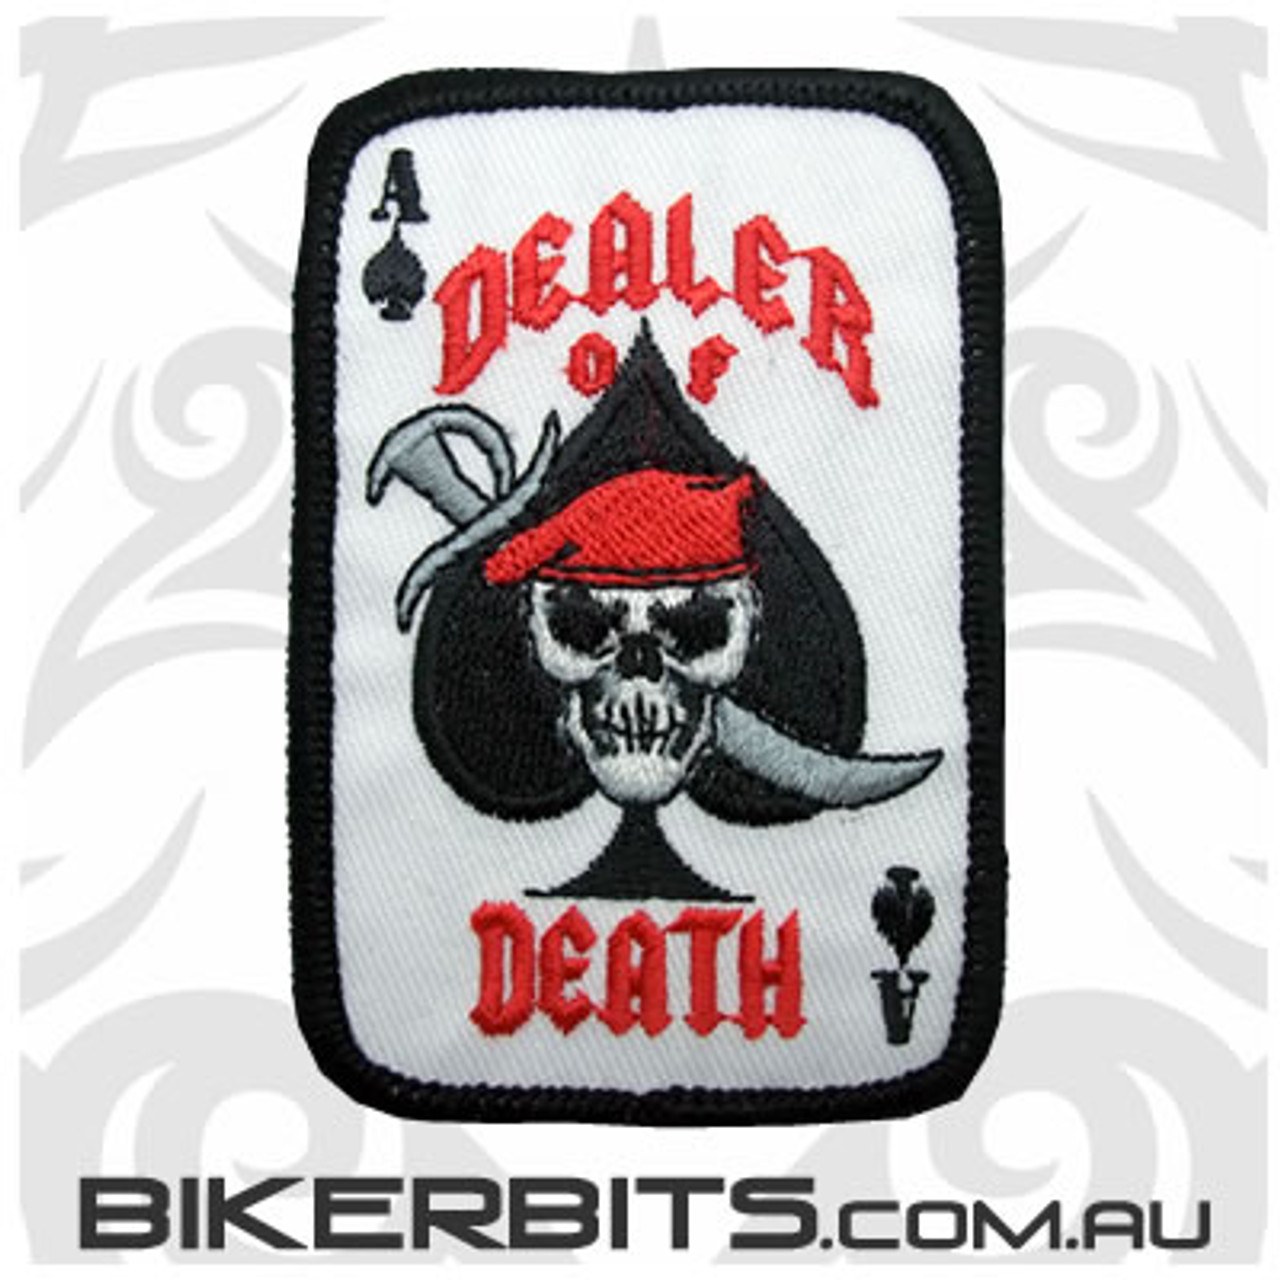 Patch - Ace of Spades - Dealer of Death